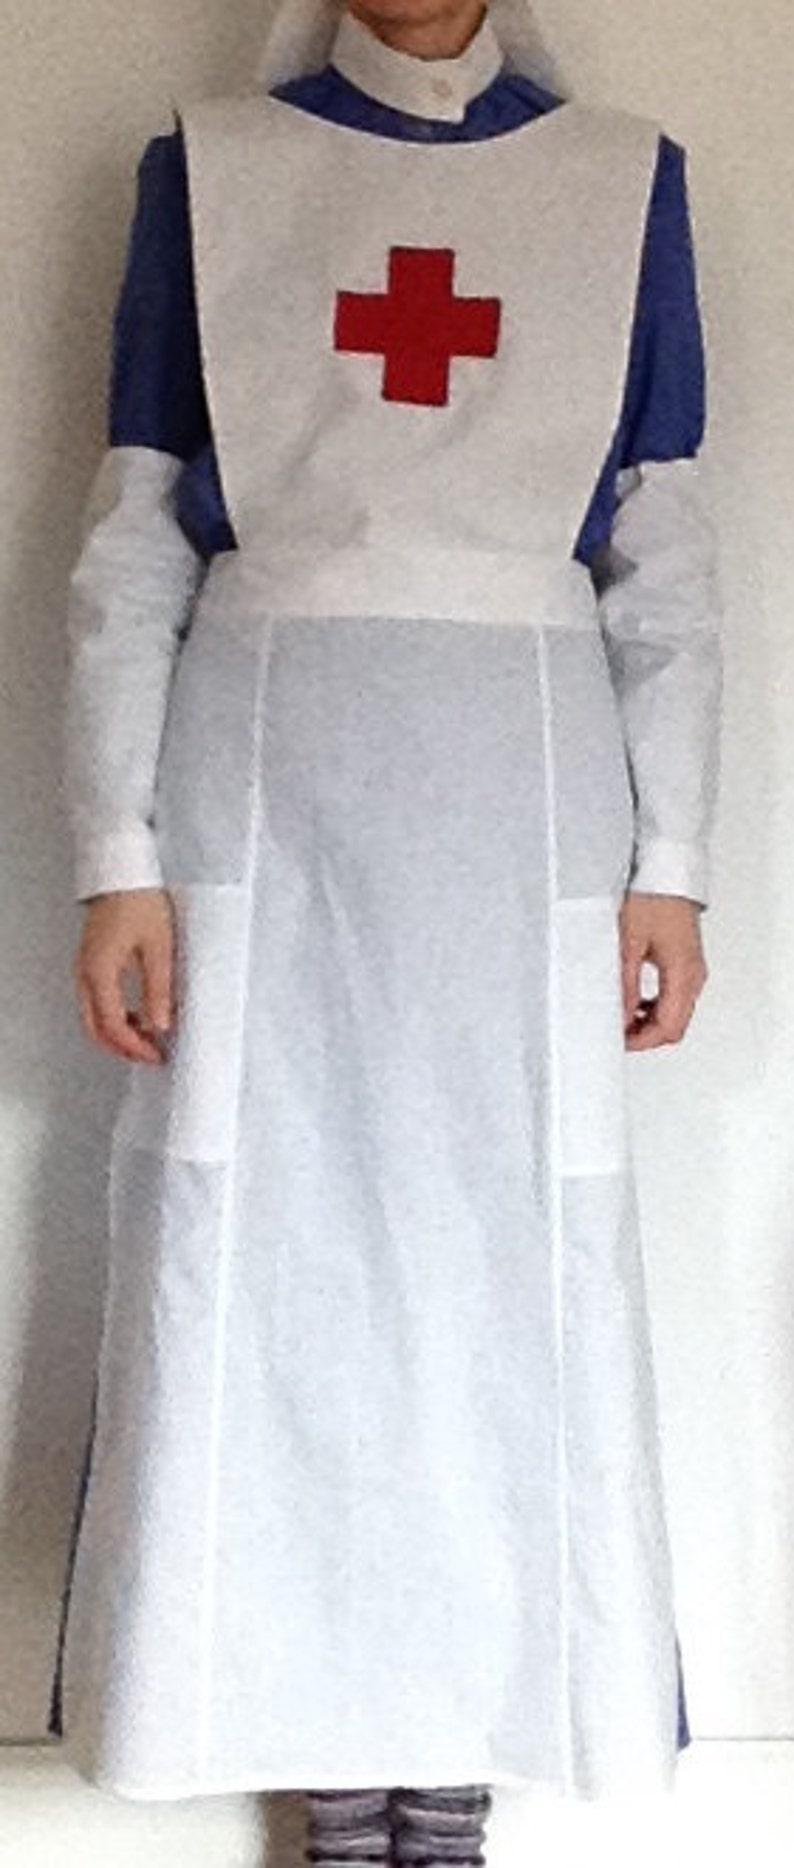 VAD uniforme stile infermiere Handmade WW1 WWI storico Costume  a559e90ae54d